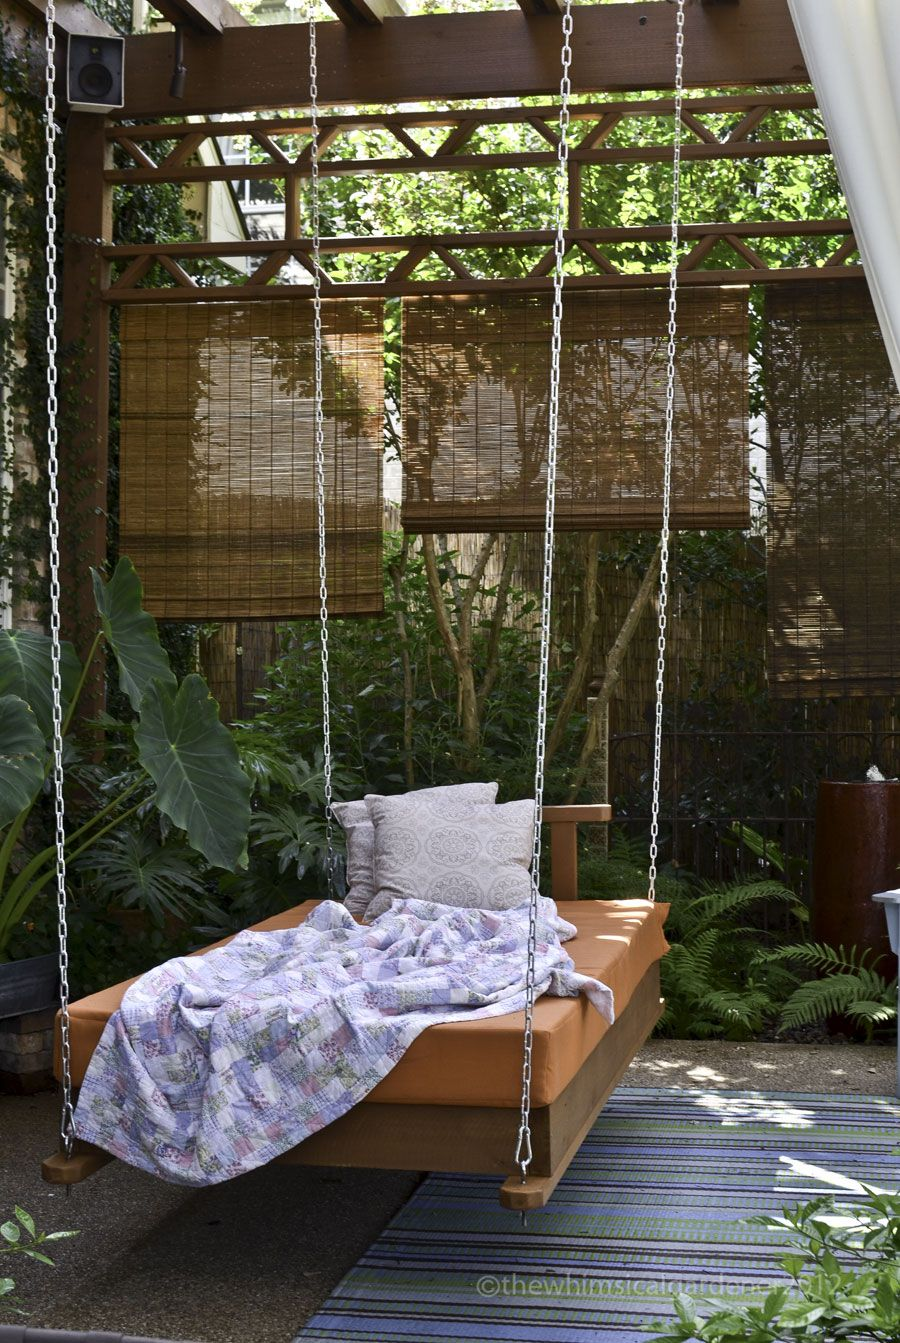 The Whimsical Gardener: garden projects | GARDEN II | Pinterest ...